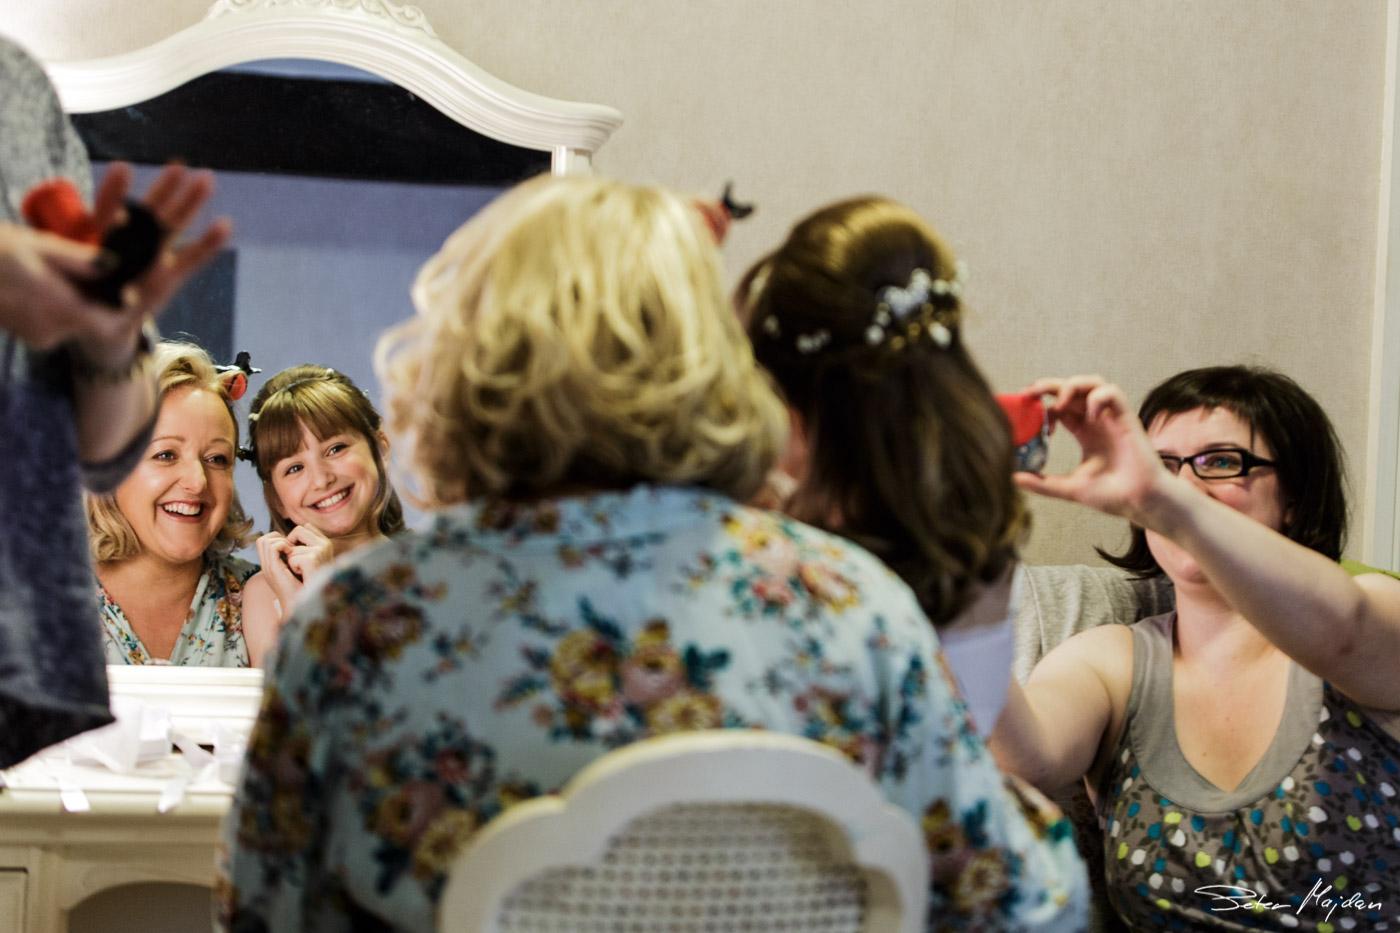 Colwick-hall-wedding-photography-5.jpg